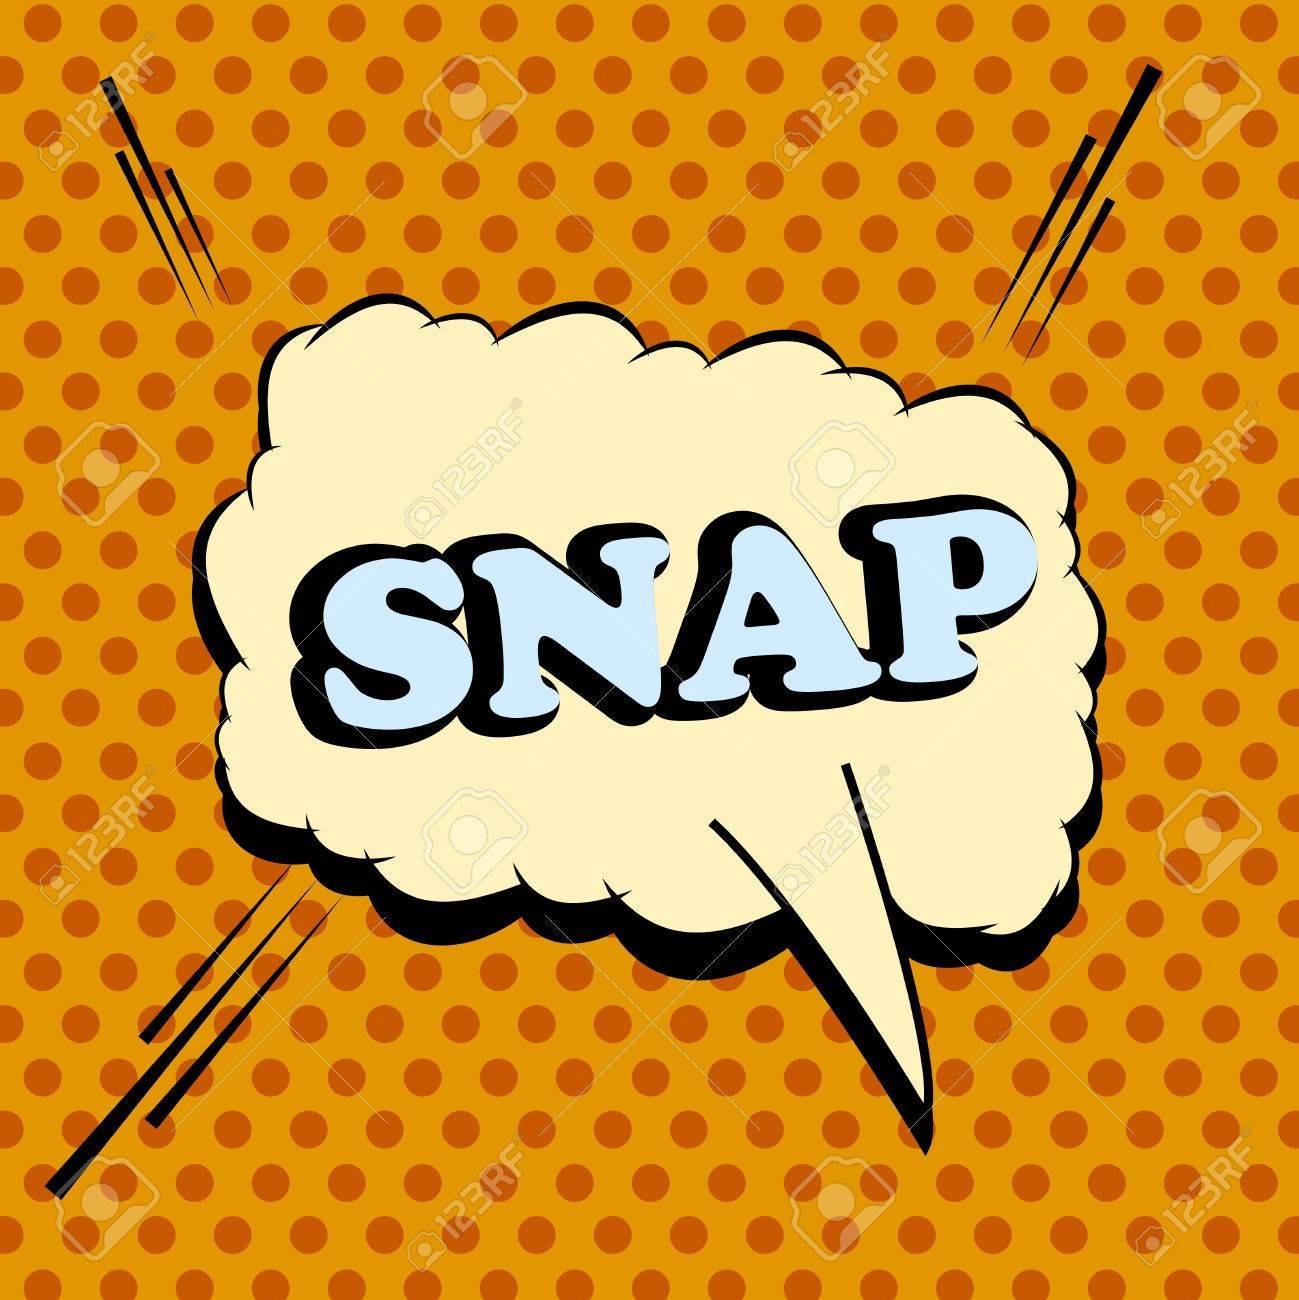 Snap comic wording  Pop-art style  Cartoon illustration with